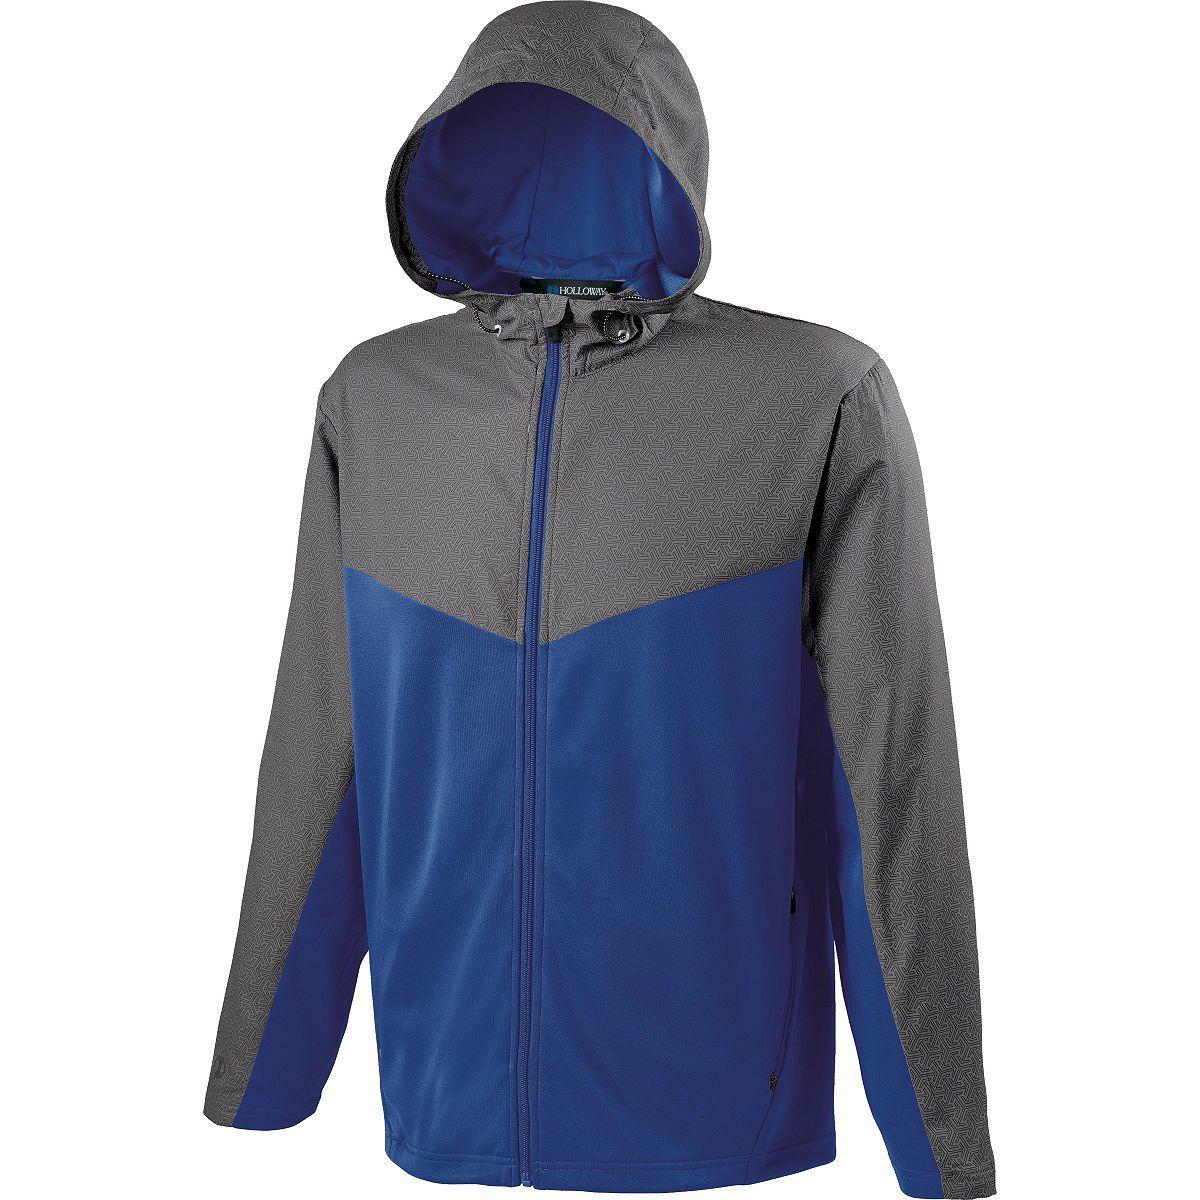 Adult Crossover Jacket - GREY PRINT/ROYAL